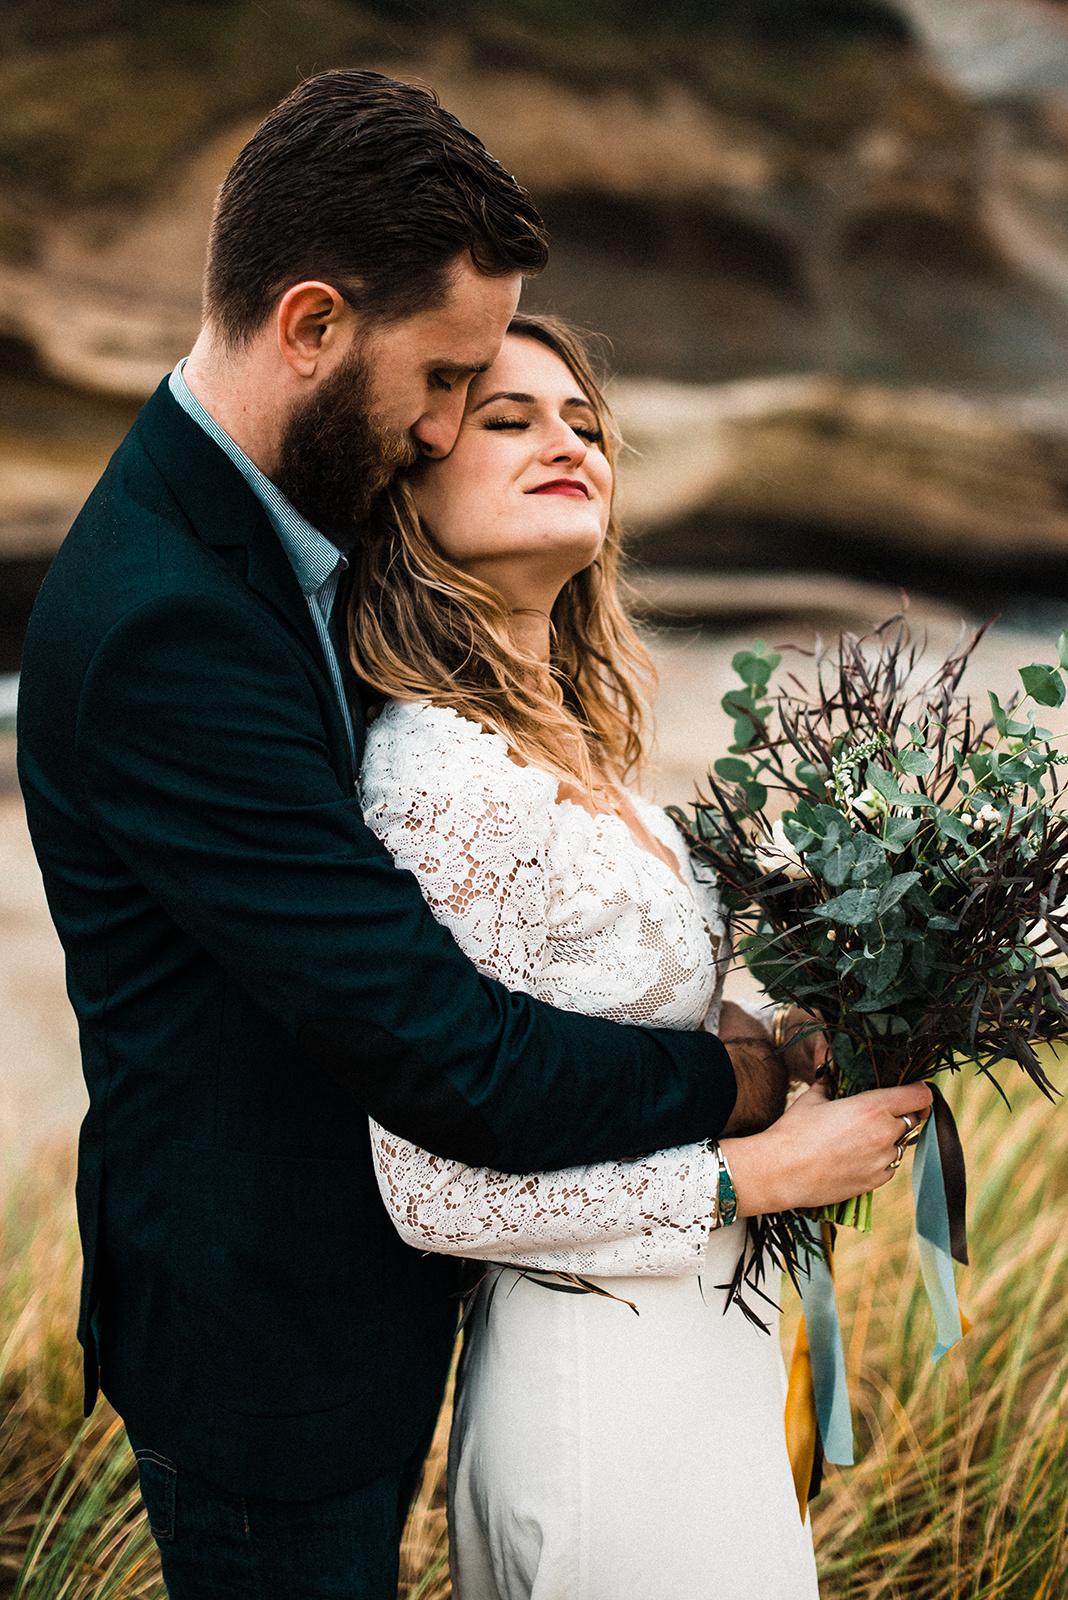 Oregon_Coast_Elopement_Wedding_The_Foxes_Photography_119-2.jpg